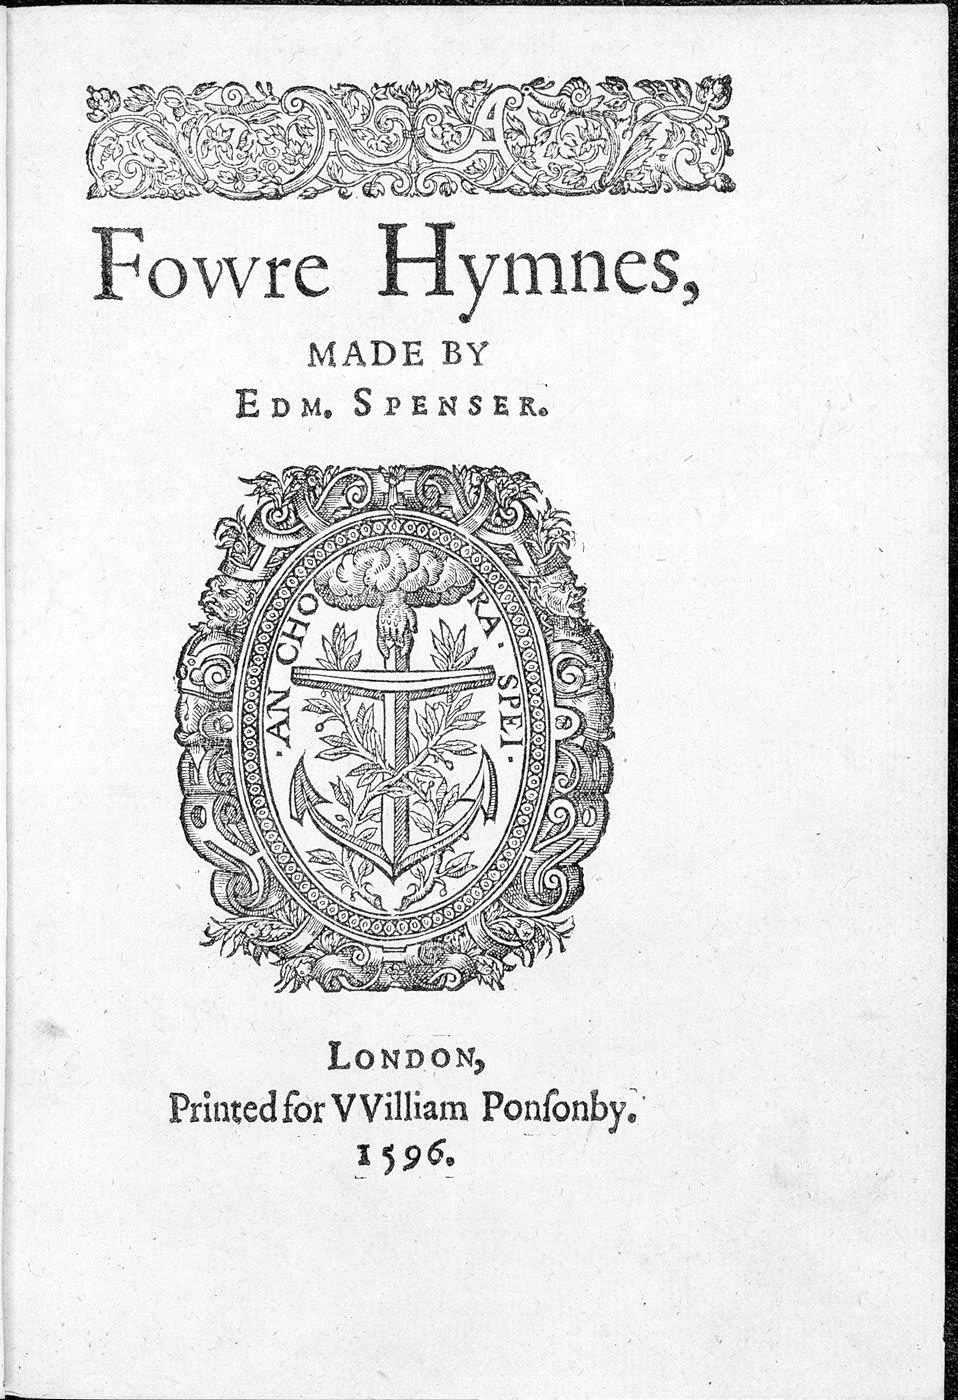 Fowre Hymnes by Edmund Spenser 1596